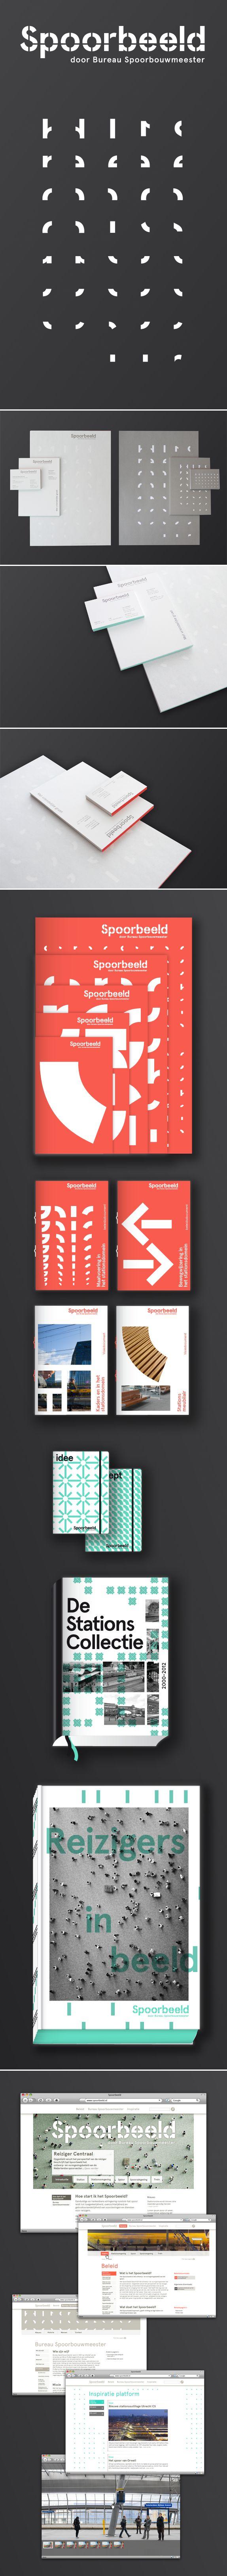 Spoorbeeld | Lava Graphic Design, Amsterdam